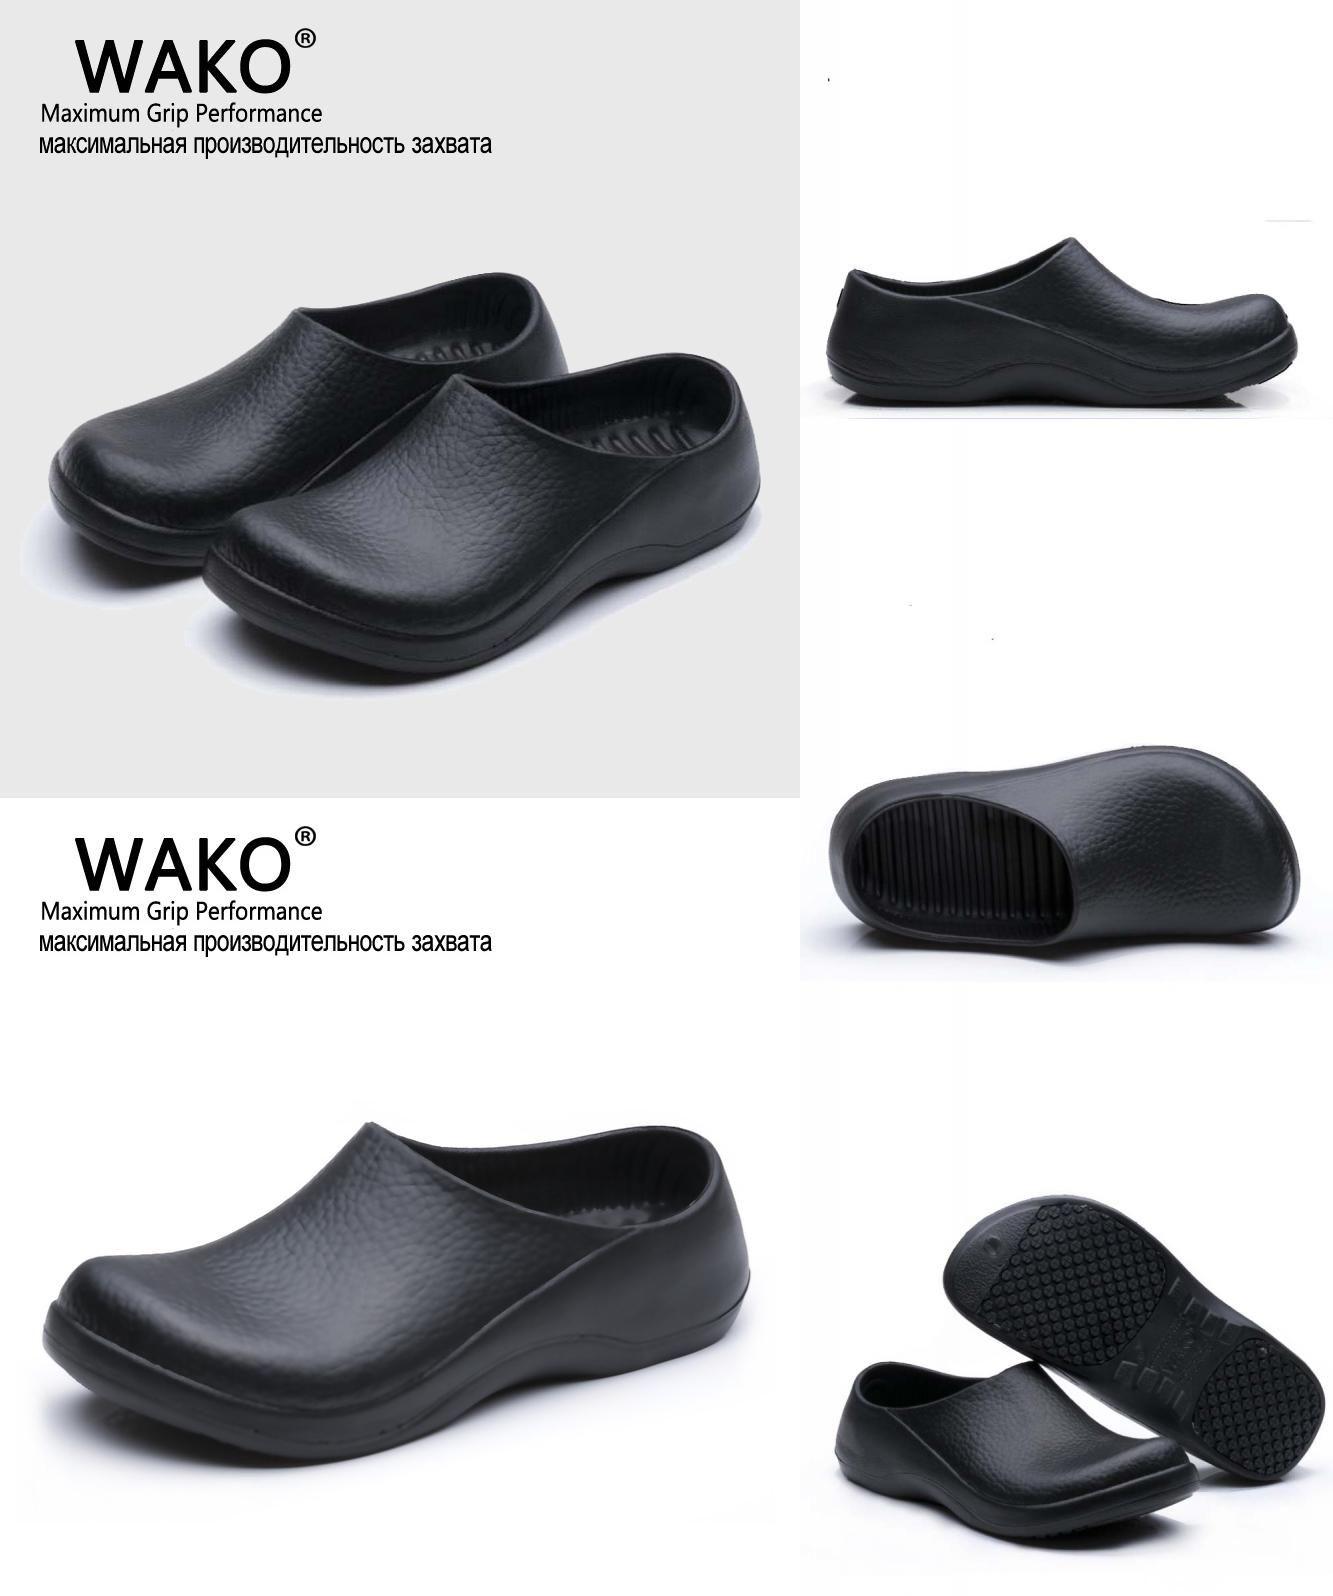 Visit to Buy] WAKO New Men\'s Chef Kitchen Working Slippers Garden ...